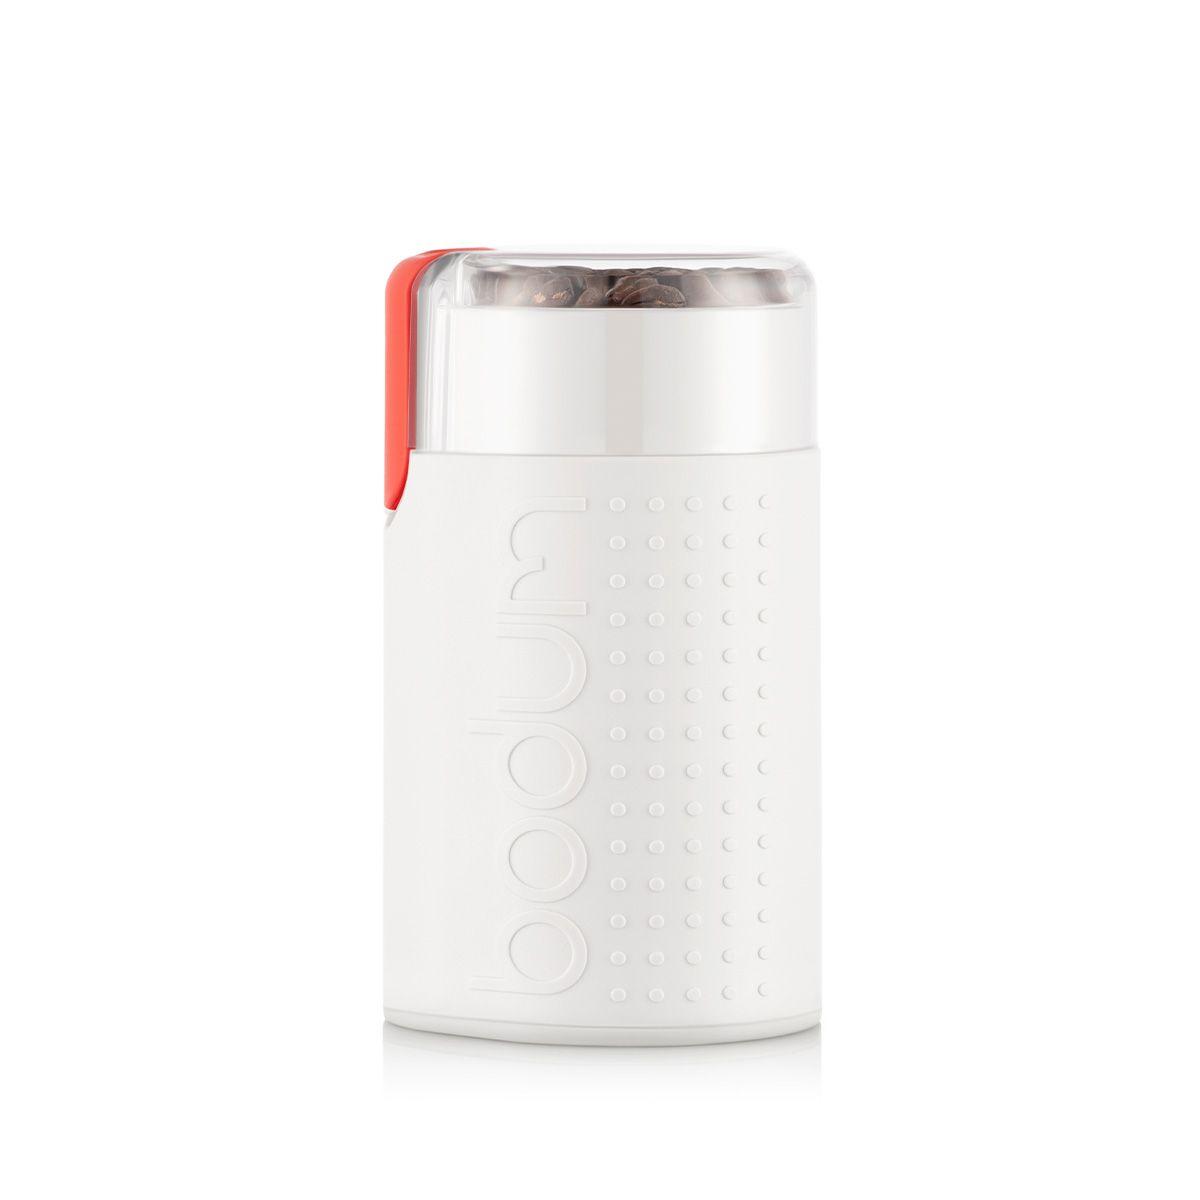 Electric Coffee Grinder BISTRO - White | BODUM